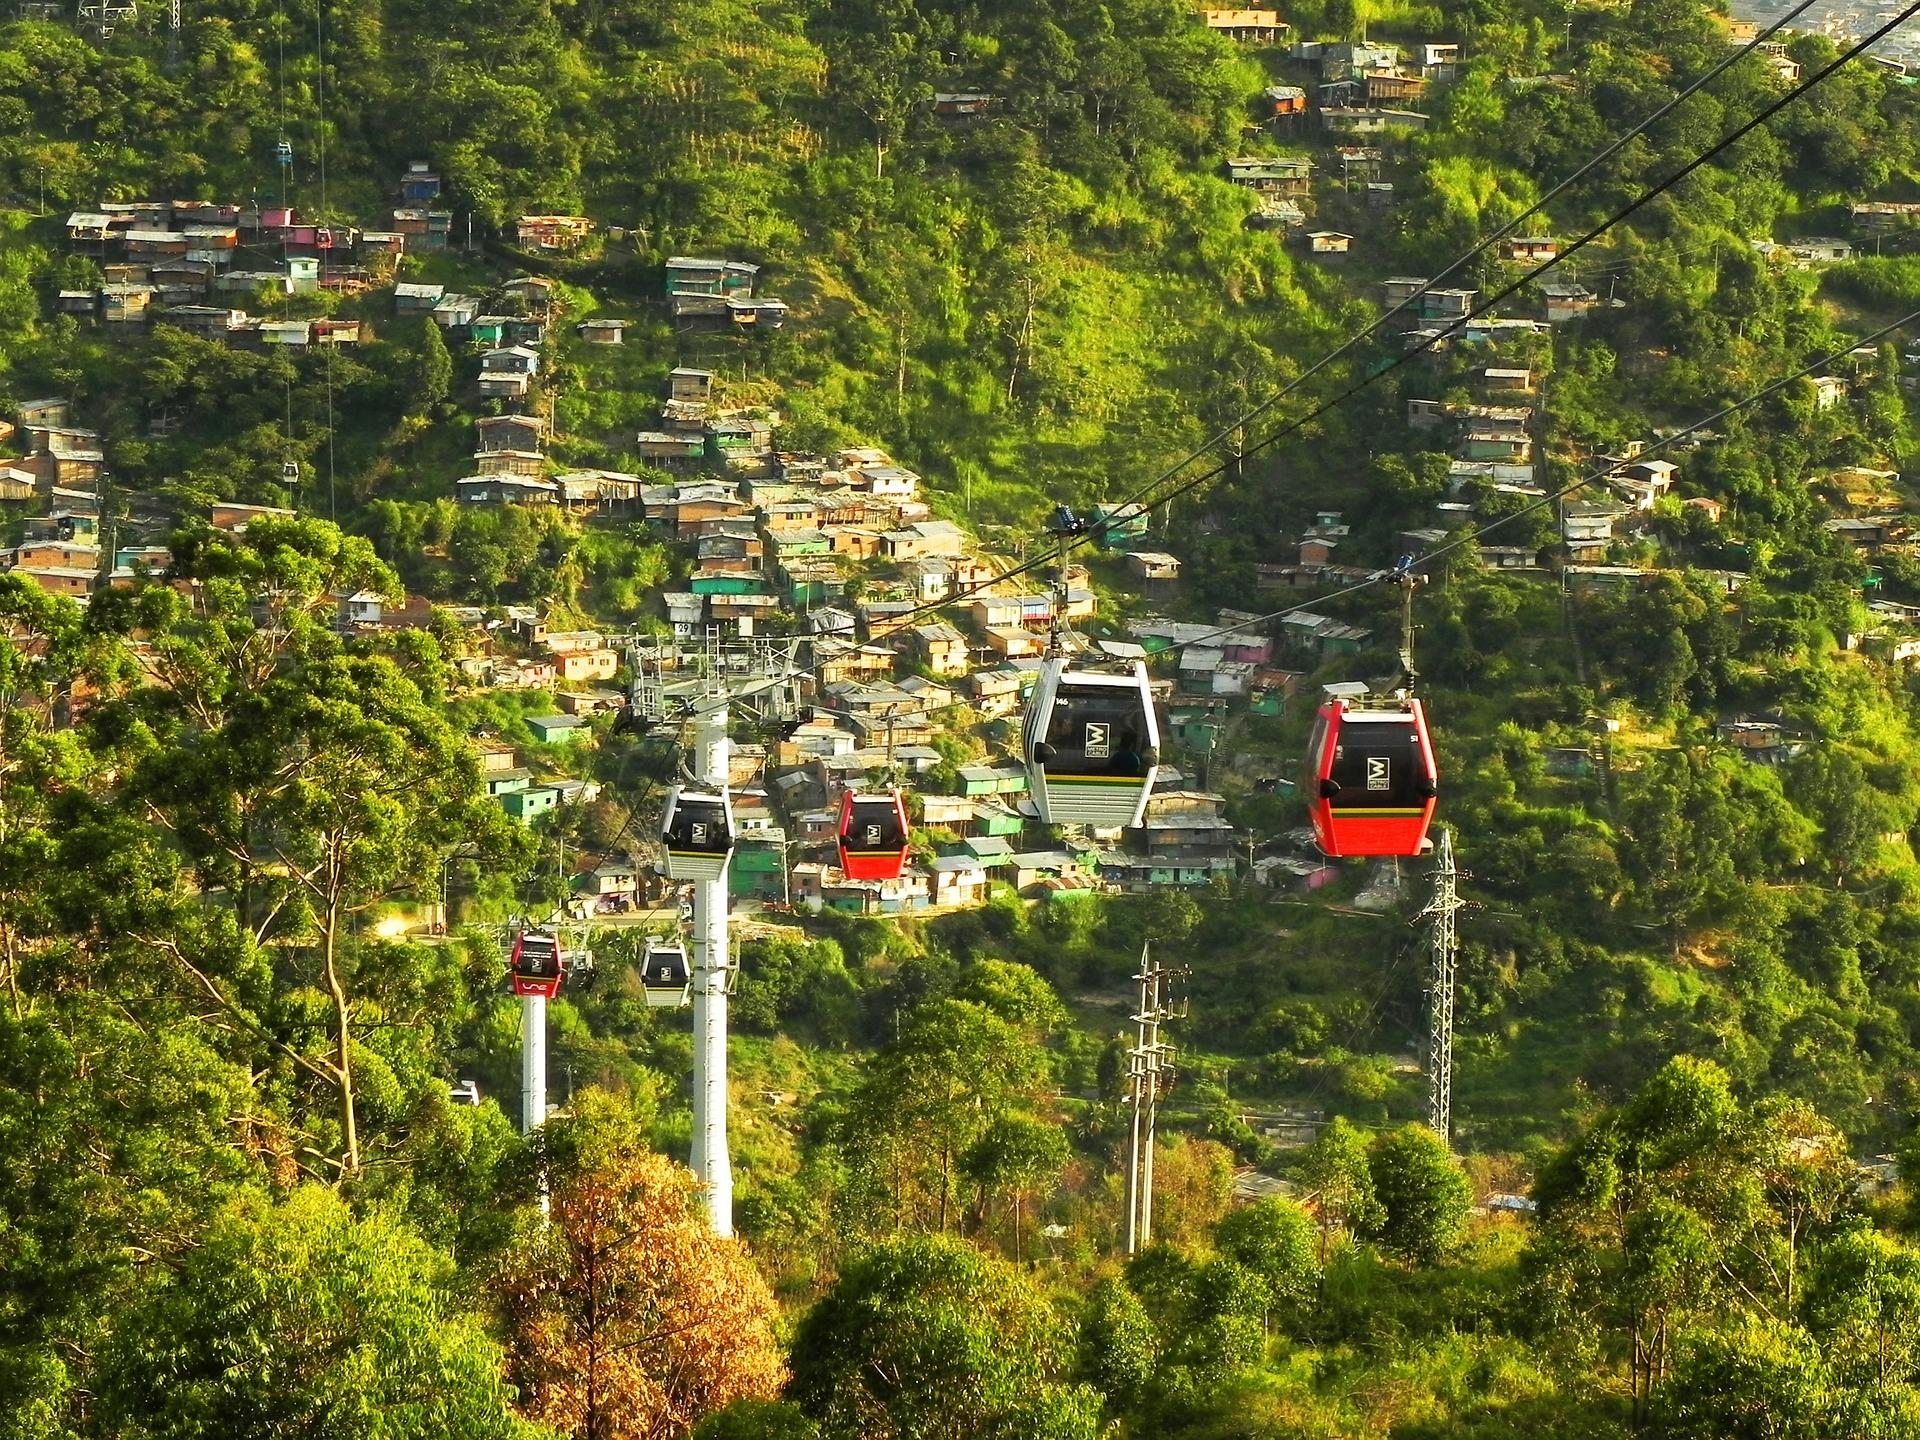 Medellin | DigiNo | 10 Best Locations For Digital Nomads